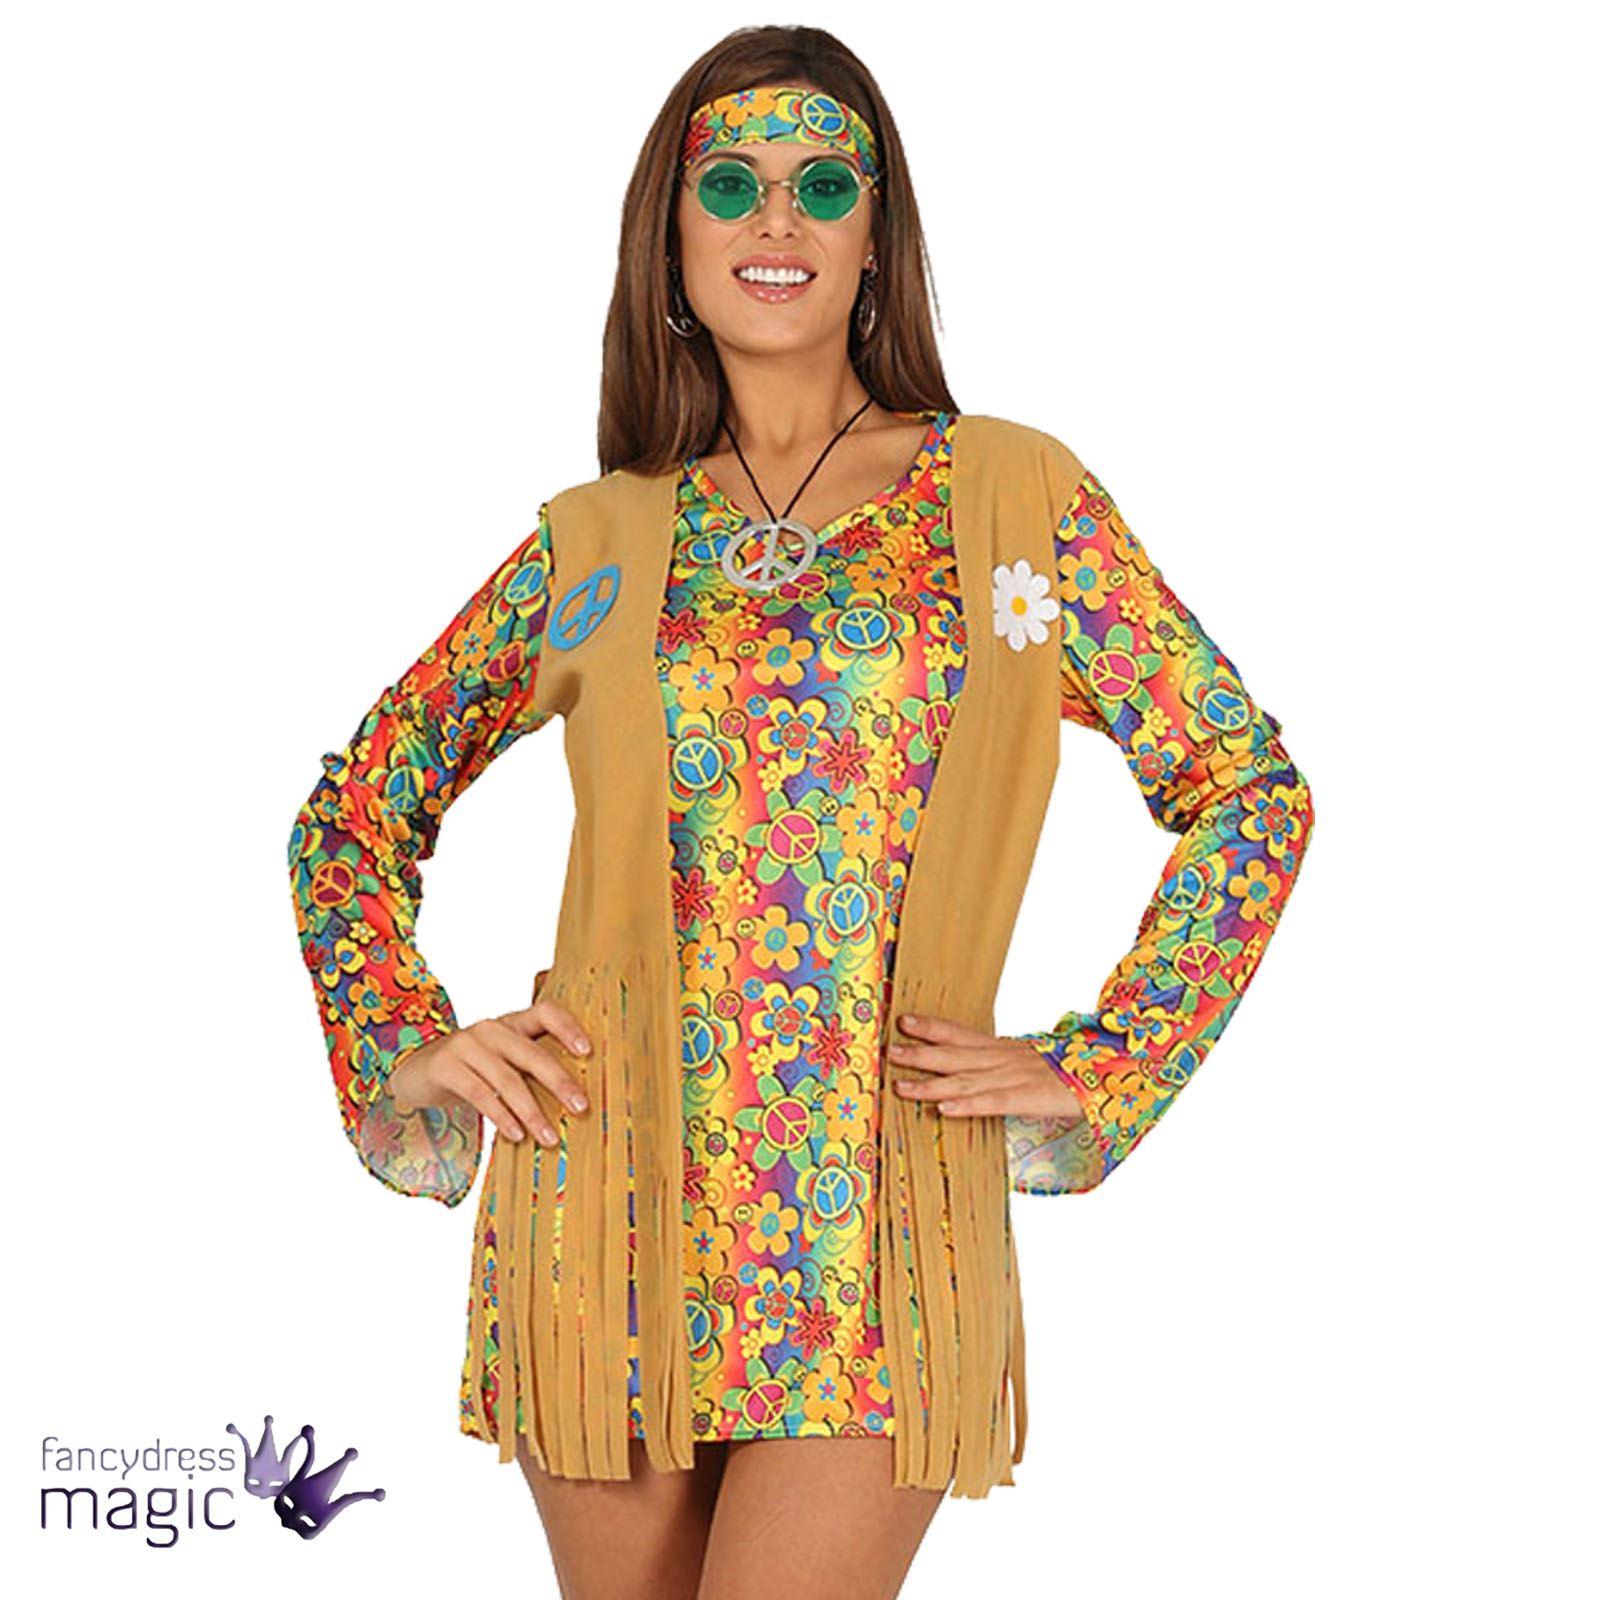 Femmes ann es 60 70 hippie costume d guisement bandeau - Hippie annee 70 ...